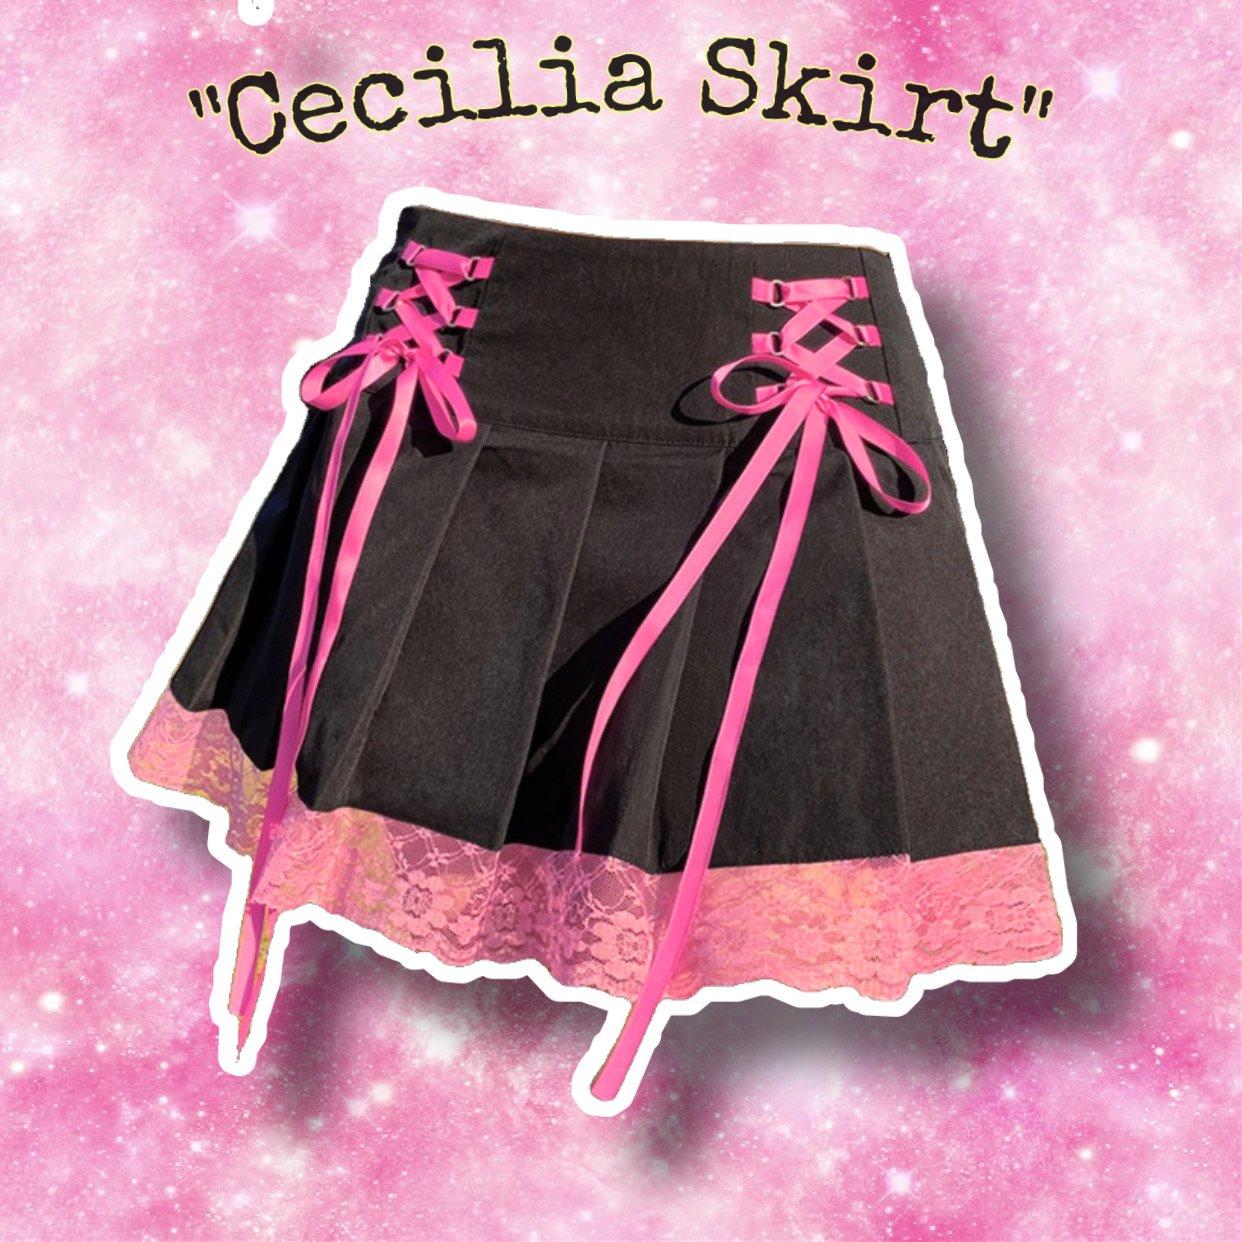 Image of Cecilia Skirt